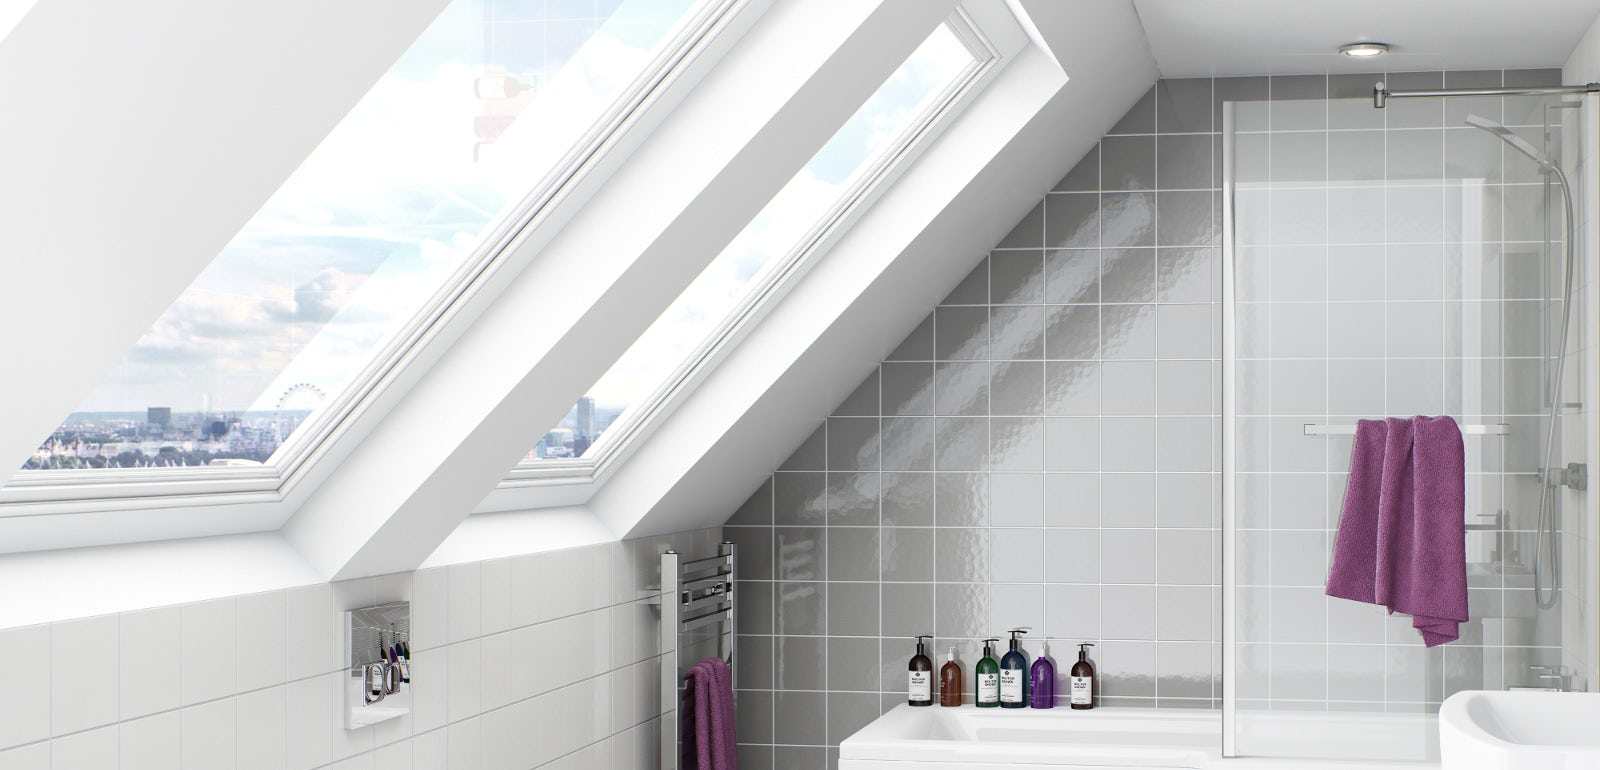 The Space Saving Boston Shower Bath | VictoriaPlum.com